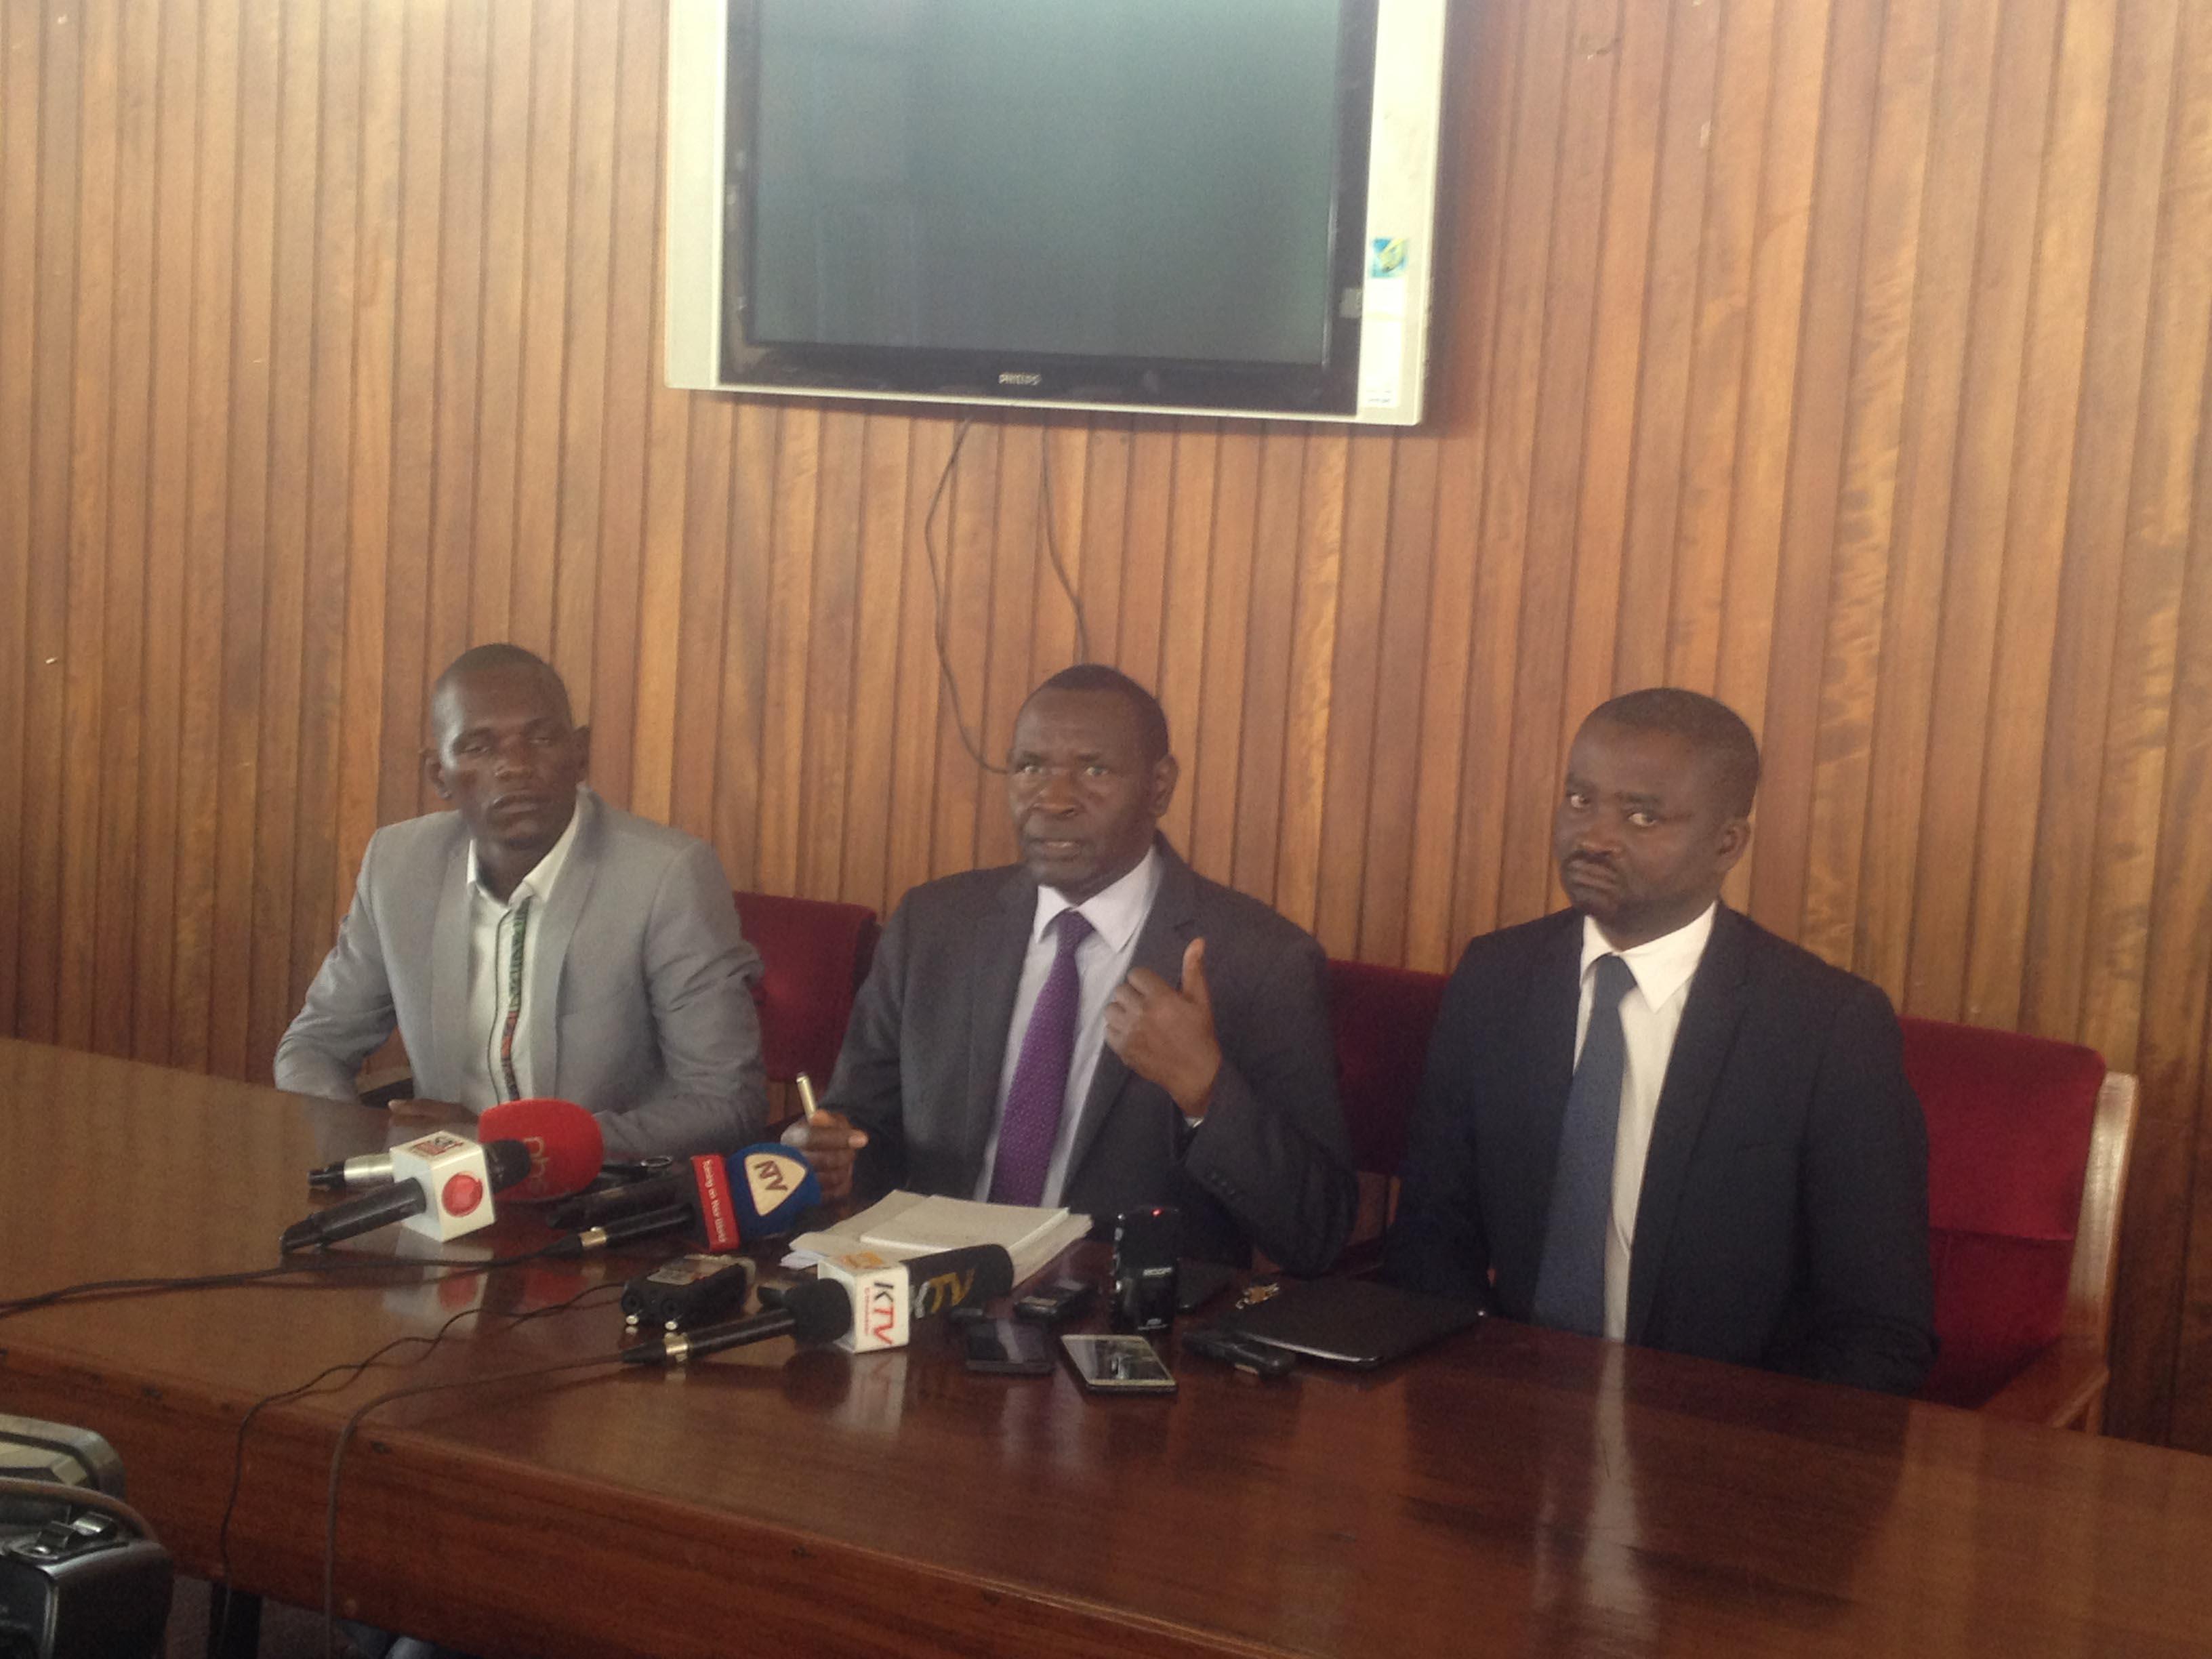 MPs Geoffrey Dhamuzungu, Alex Byarugaba and Silas Aogon at Parliament today. Photo by Beatrice Leni.